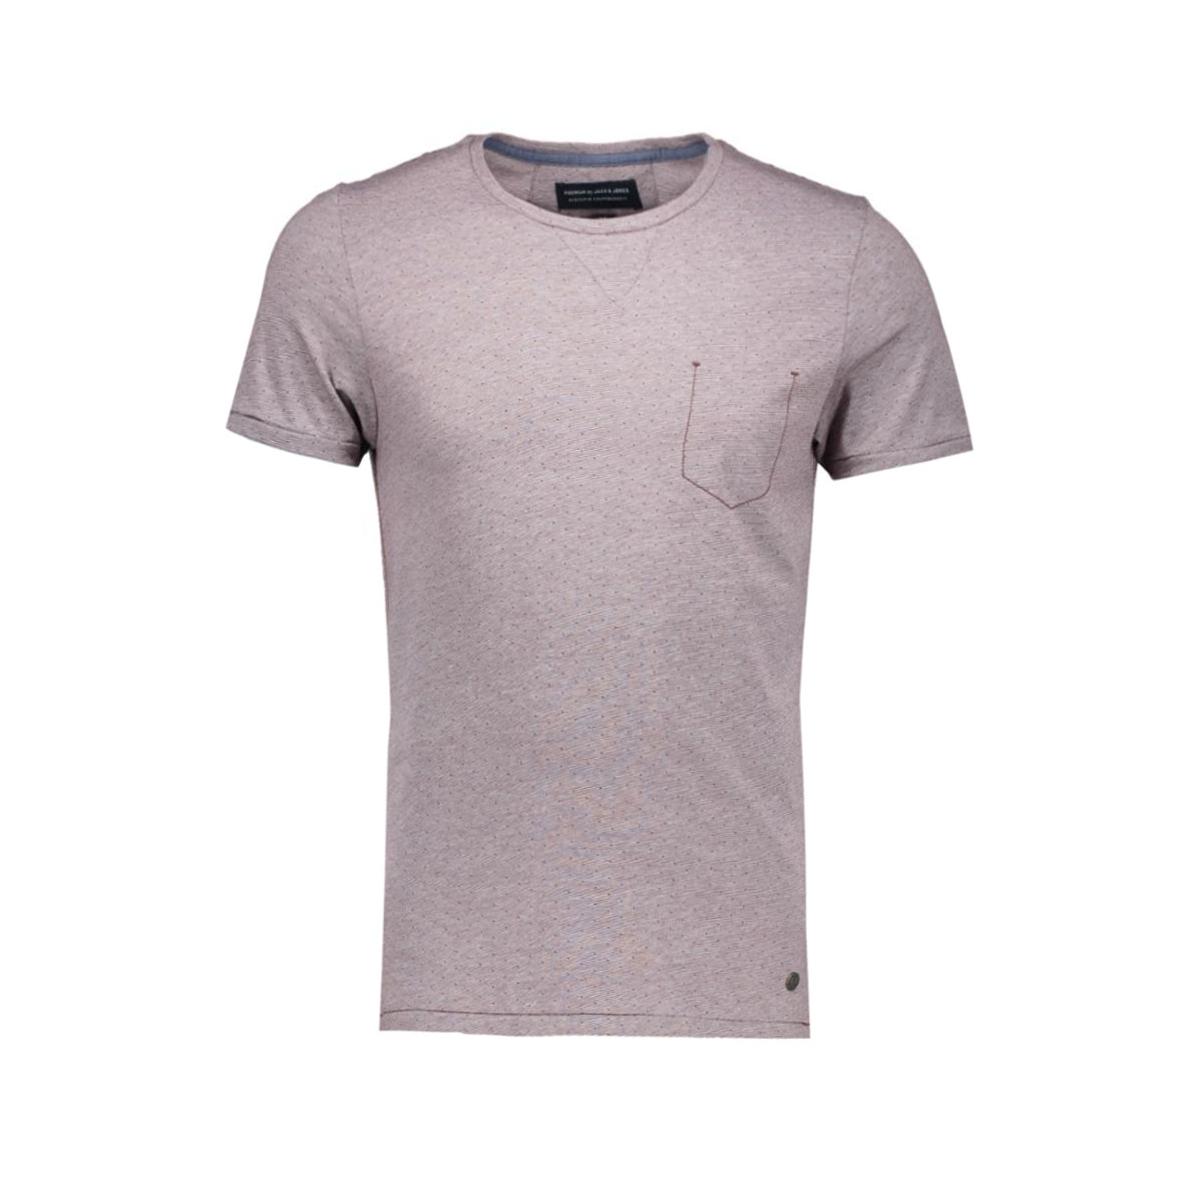 jjprjack tee ss crew neck 12105309 jack & jones t-shirt sassafras